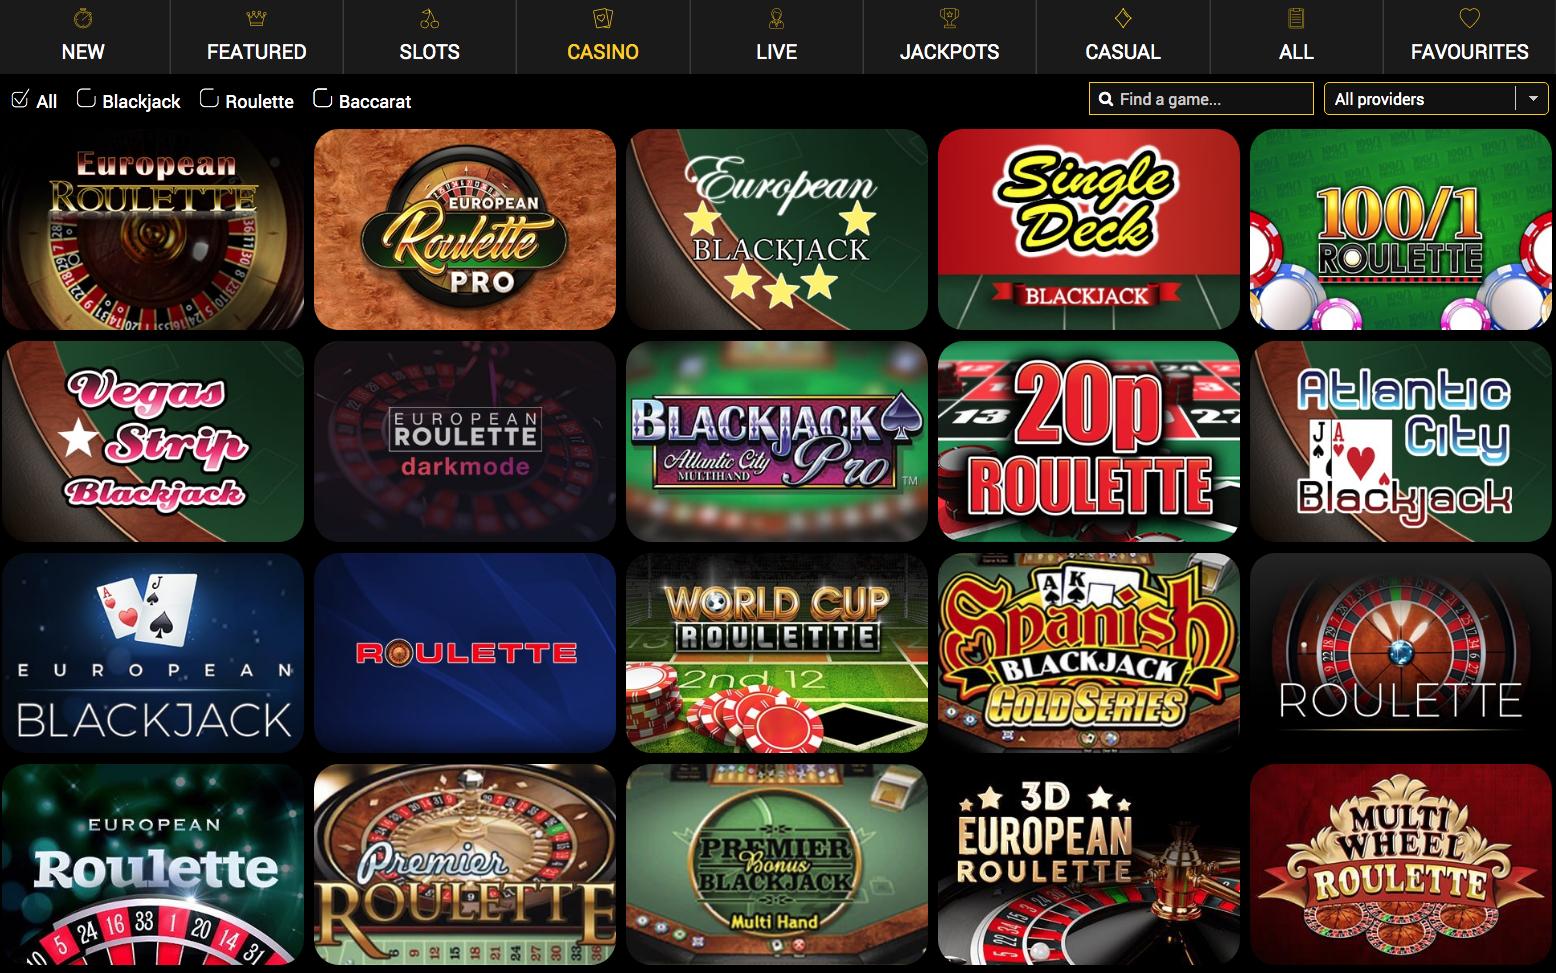 silver sands casino mobile app